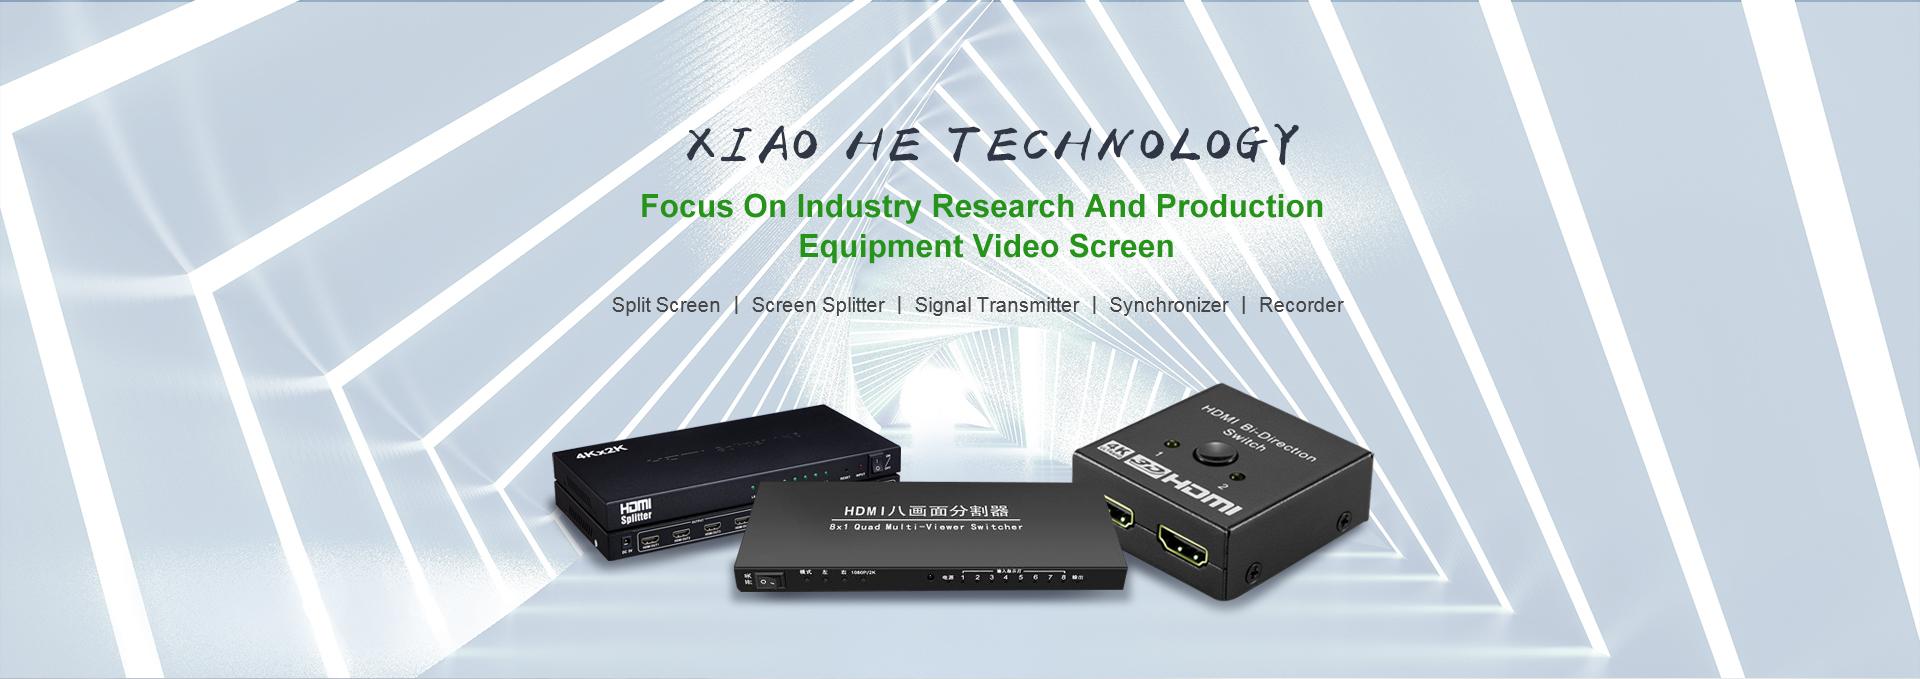 HDMI distributor